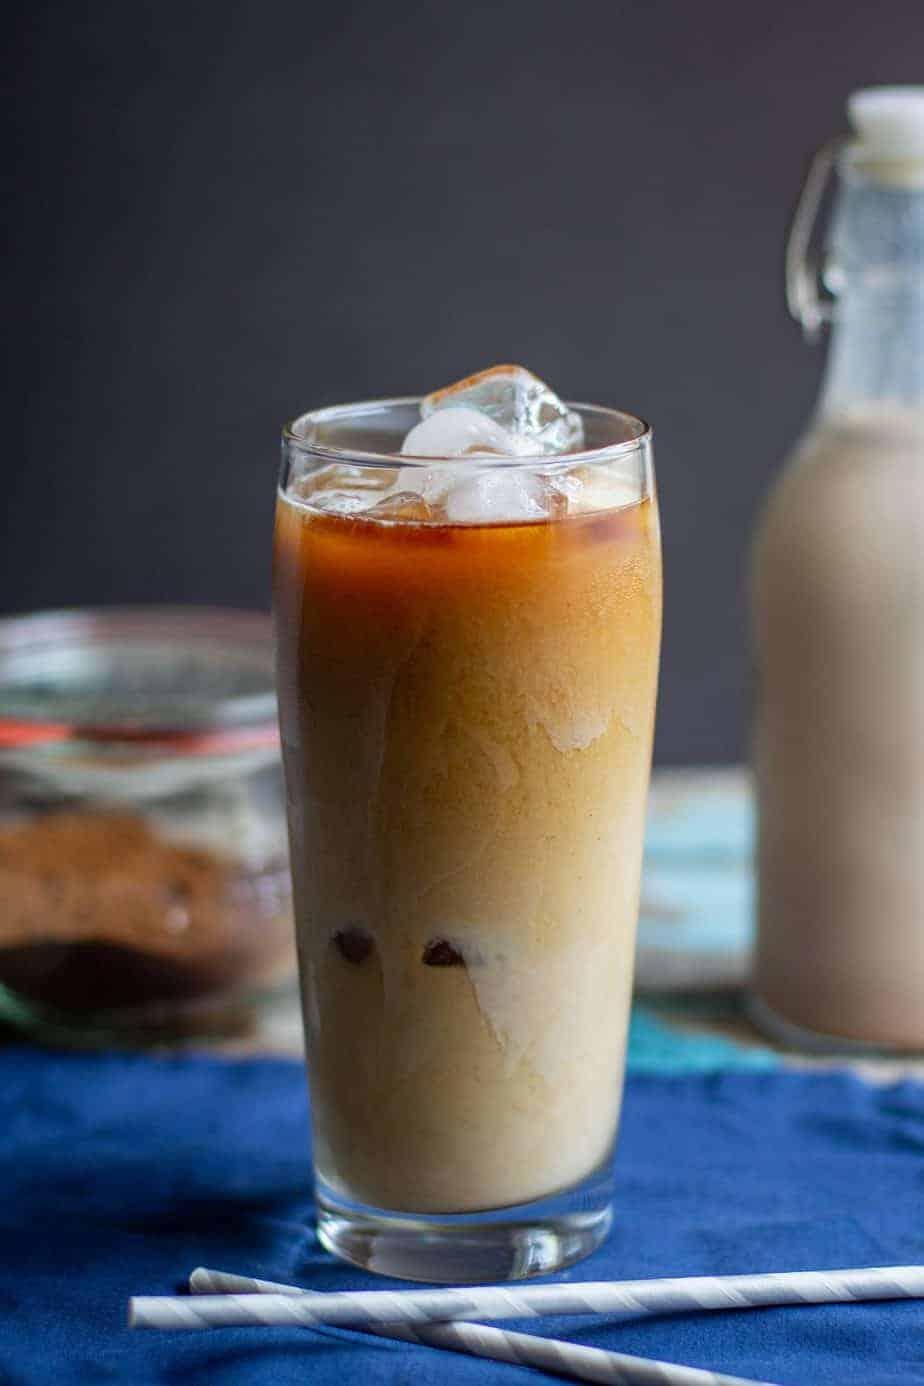 Homemade Pumpkin Spice Cold Brew Coffee A Nerd Cooks